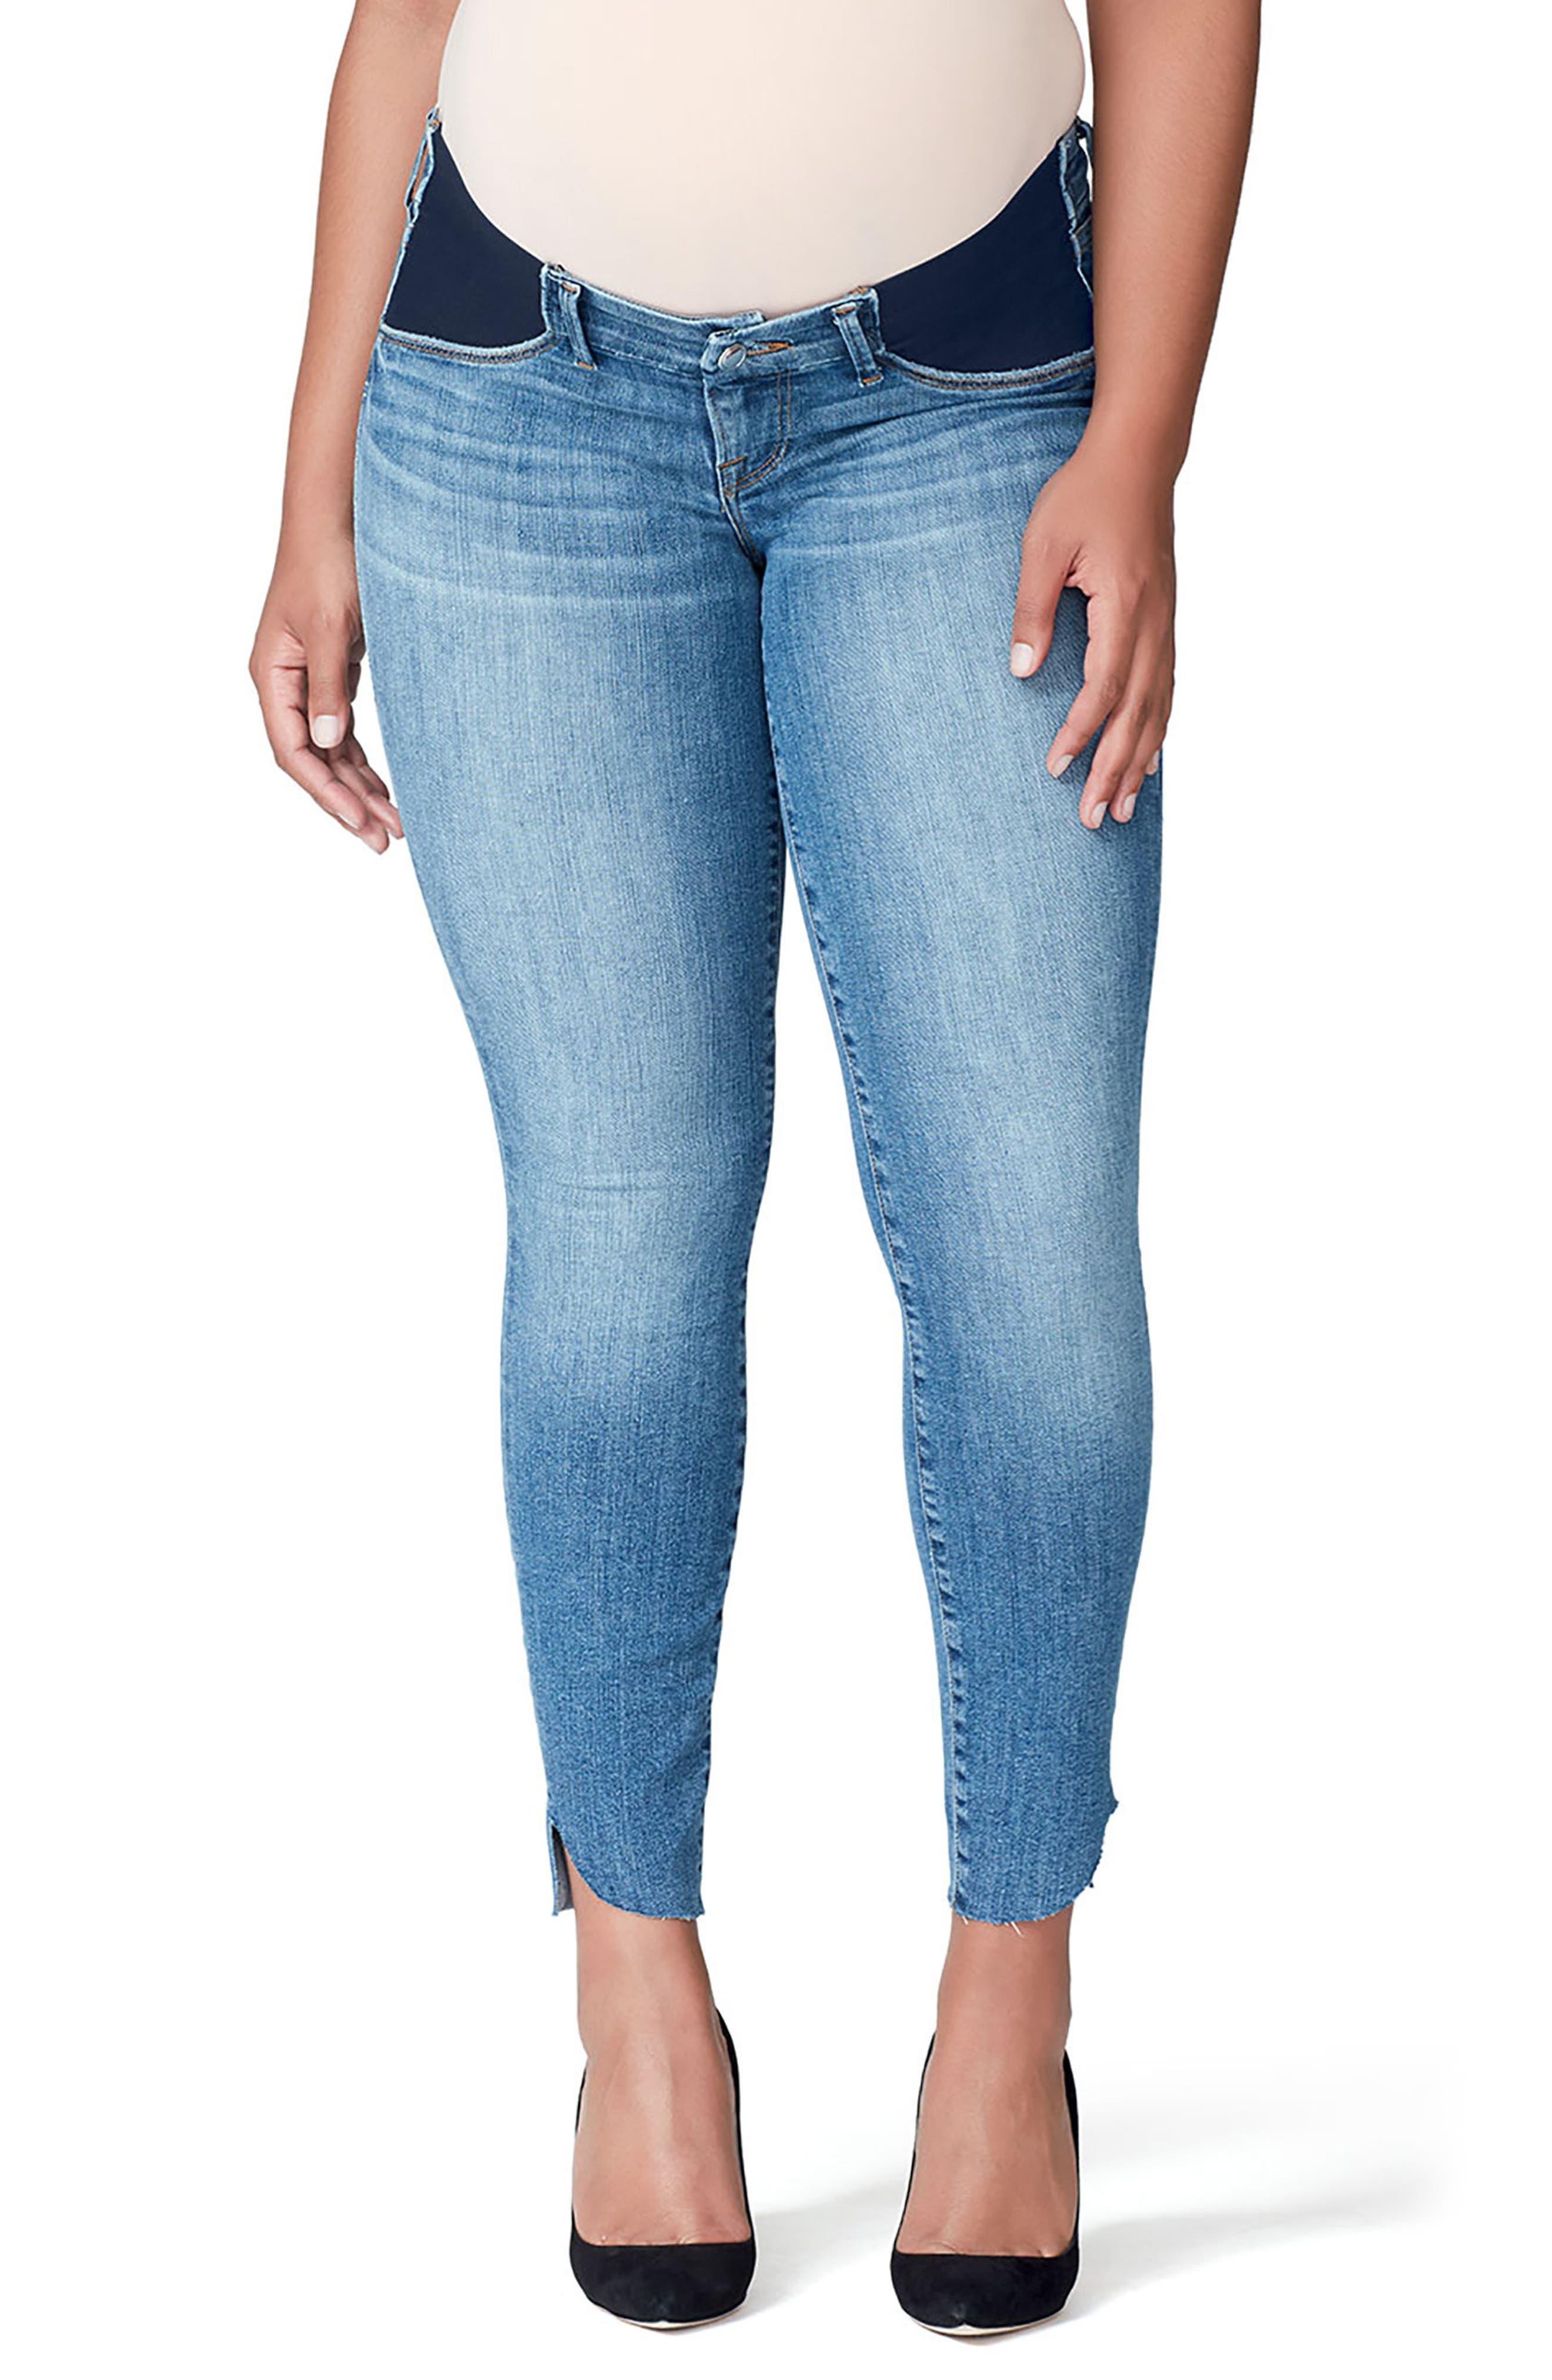 Women's Good American Good Mama The Honeymoon Low Rise Cascade Hem Maternity Skinny Jeans